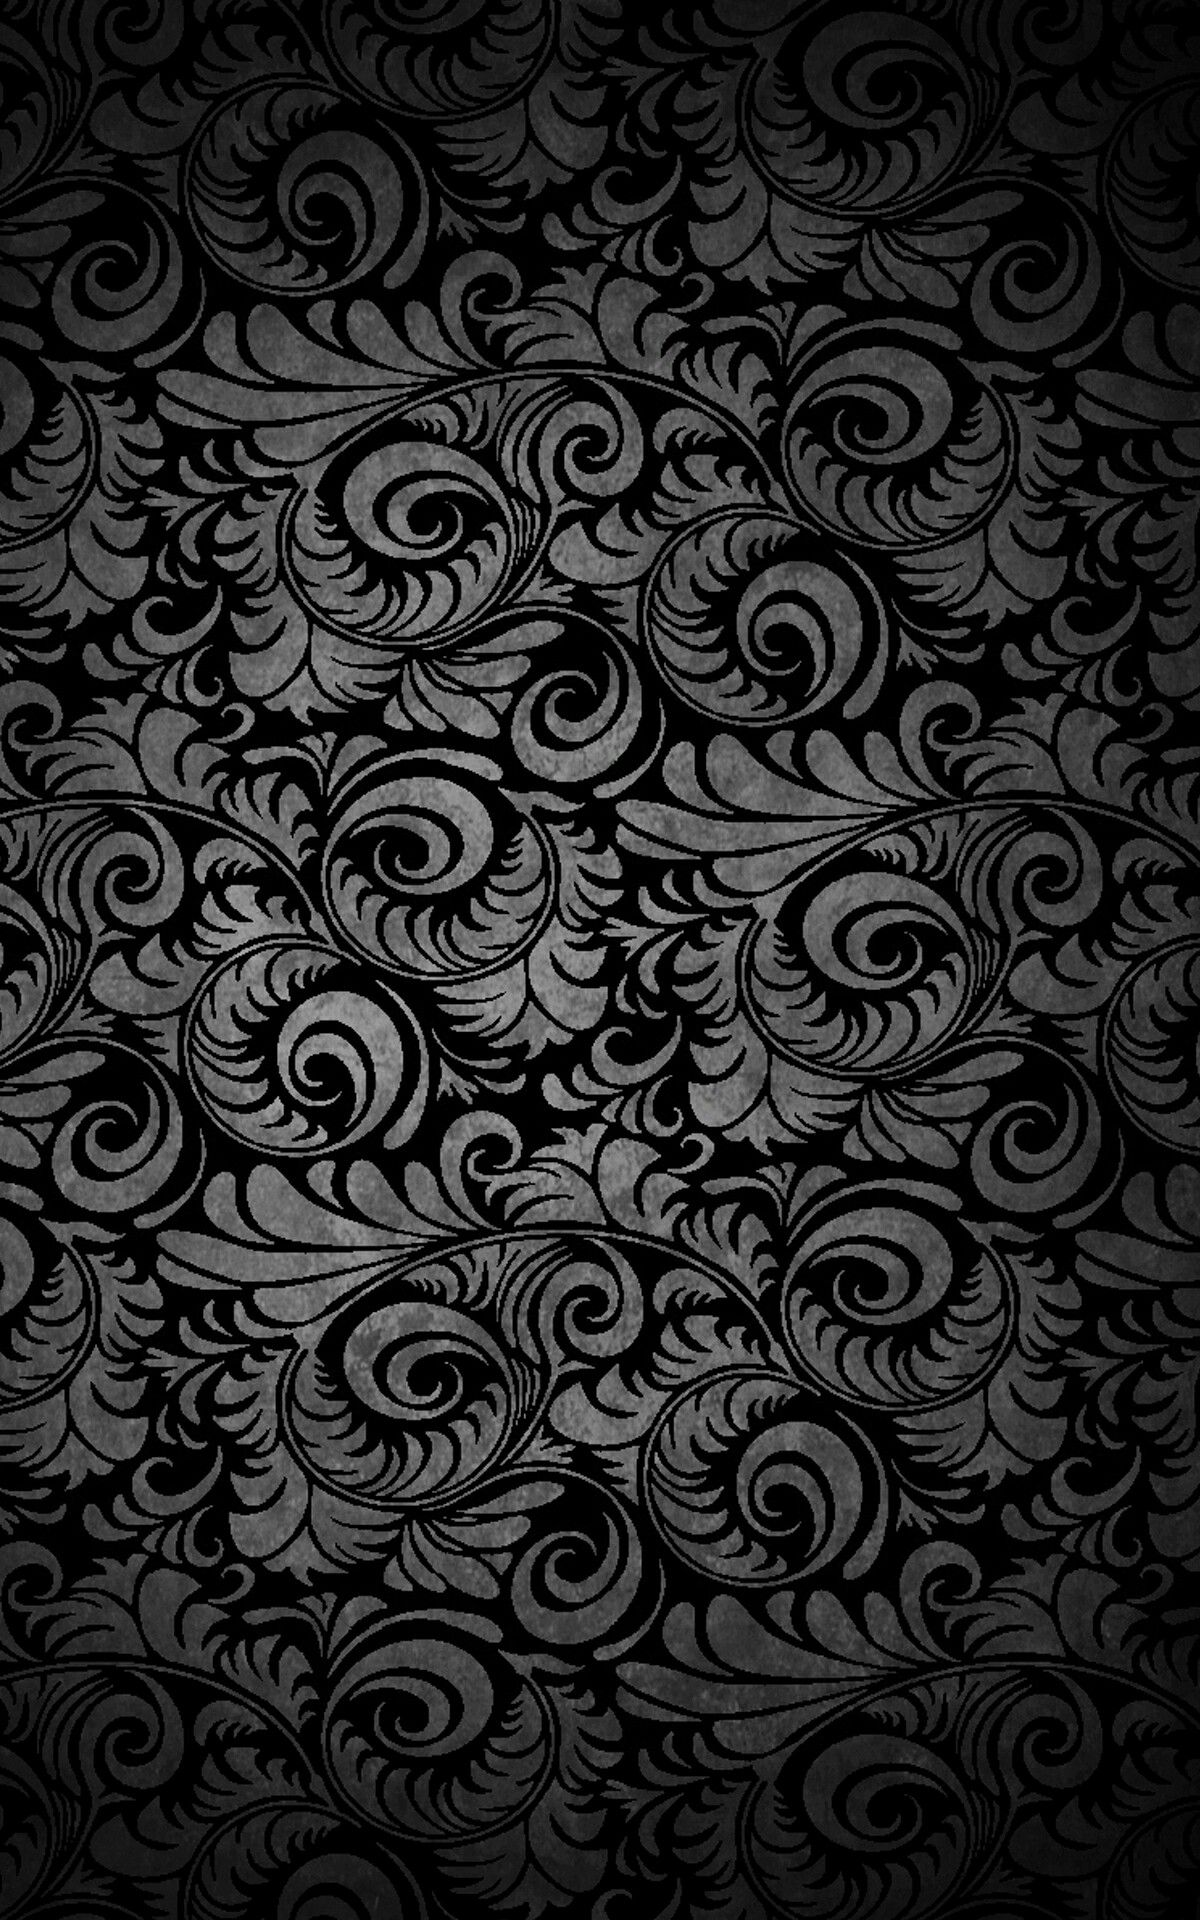 Pin By Husain Saddam On Wallpaper Classy Wallpaper Iphone 6 Plus Wallpaper Black Wallpaper